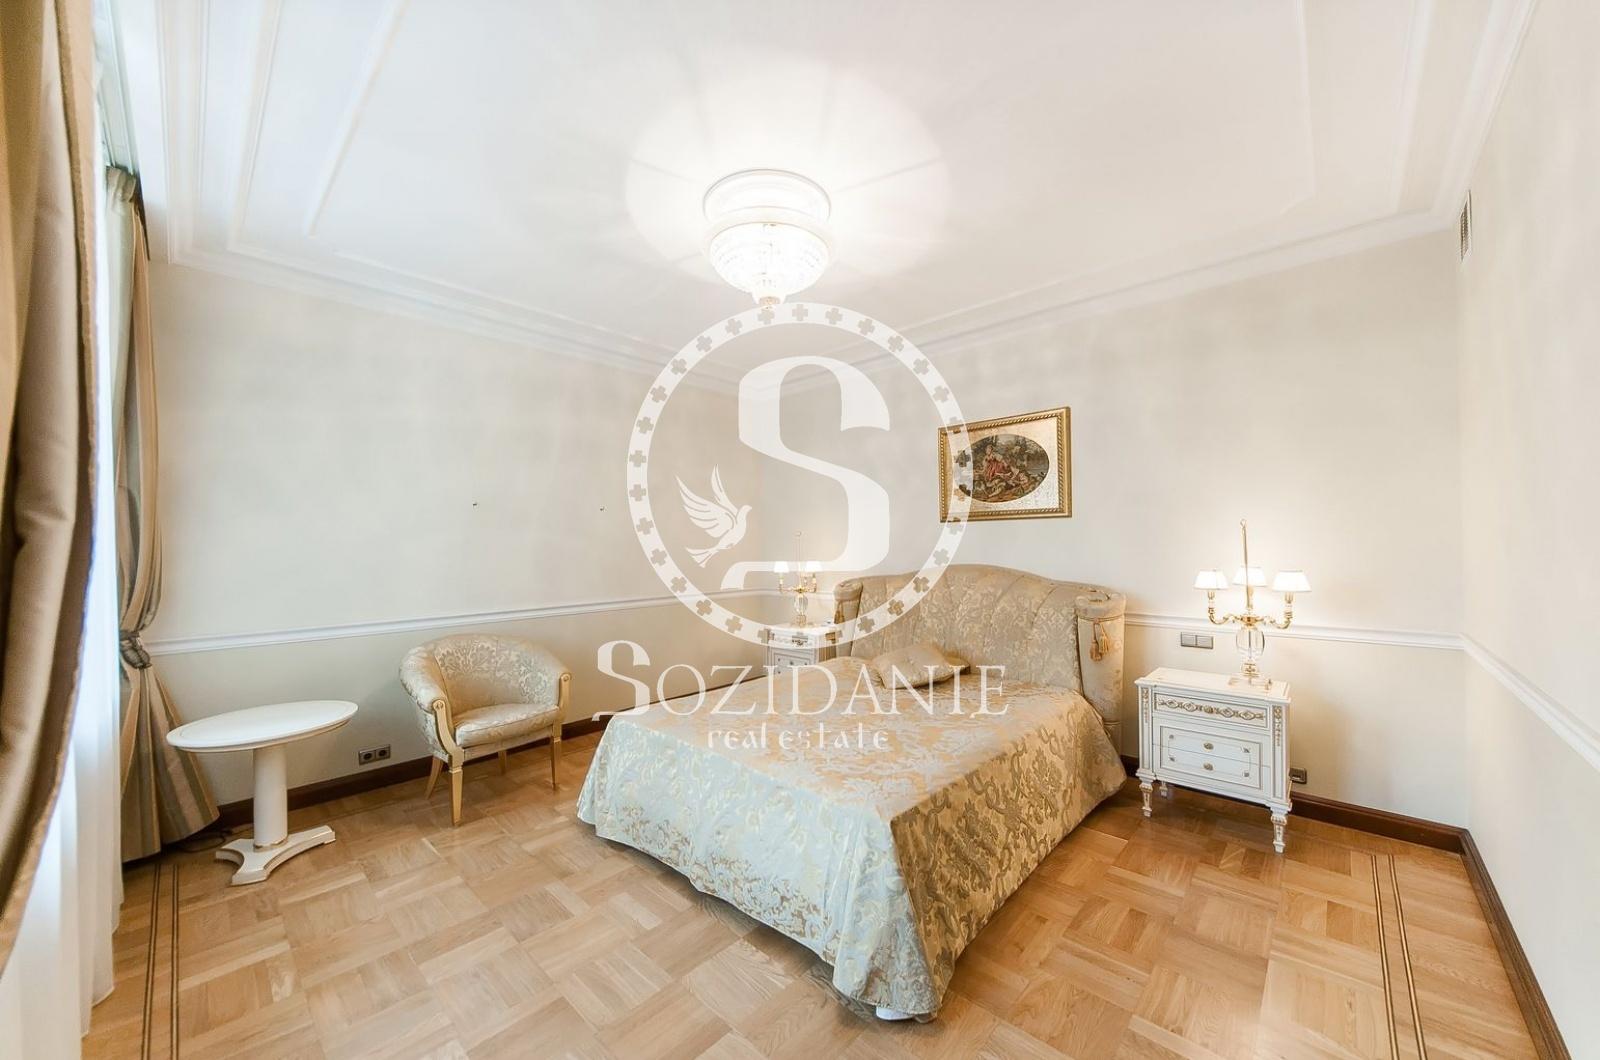 3 Комнаты, Городская, Продажа, Улица Тверская, Listing ID 1295, Москва, Россия,